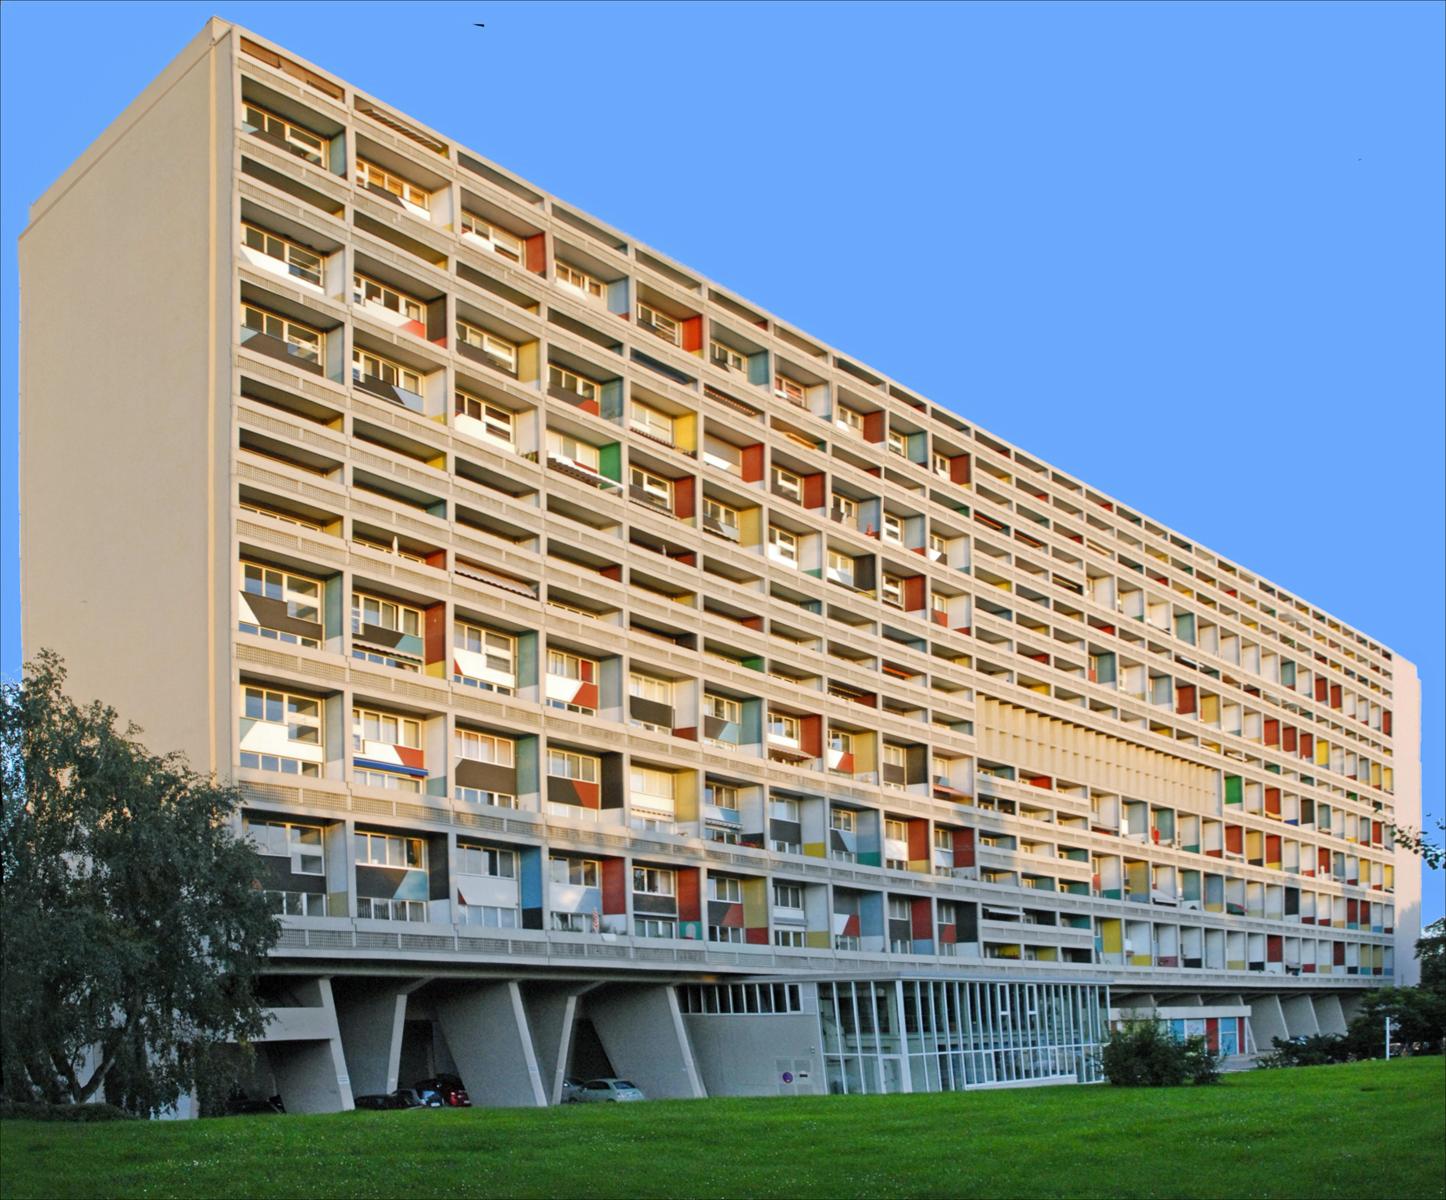 file corbusierhaus berlin 6305809373 jpg wikimedia commons